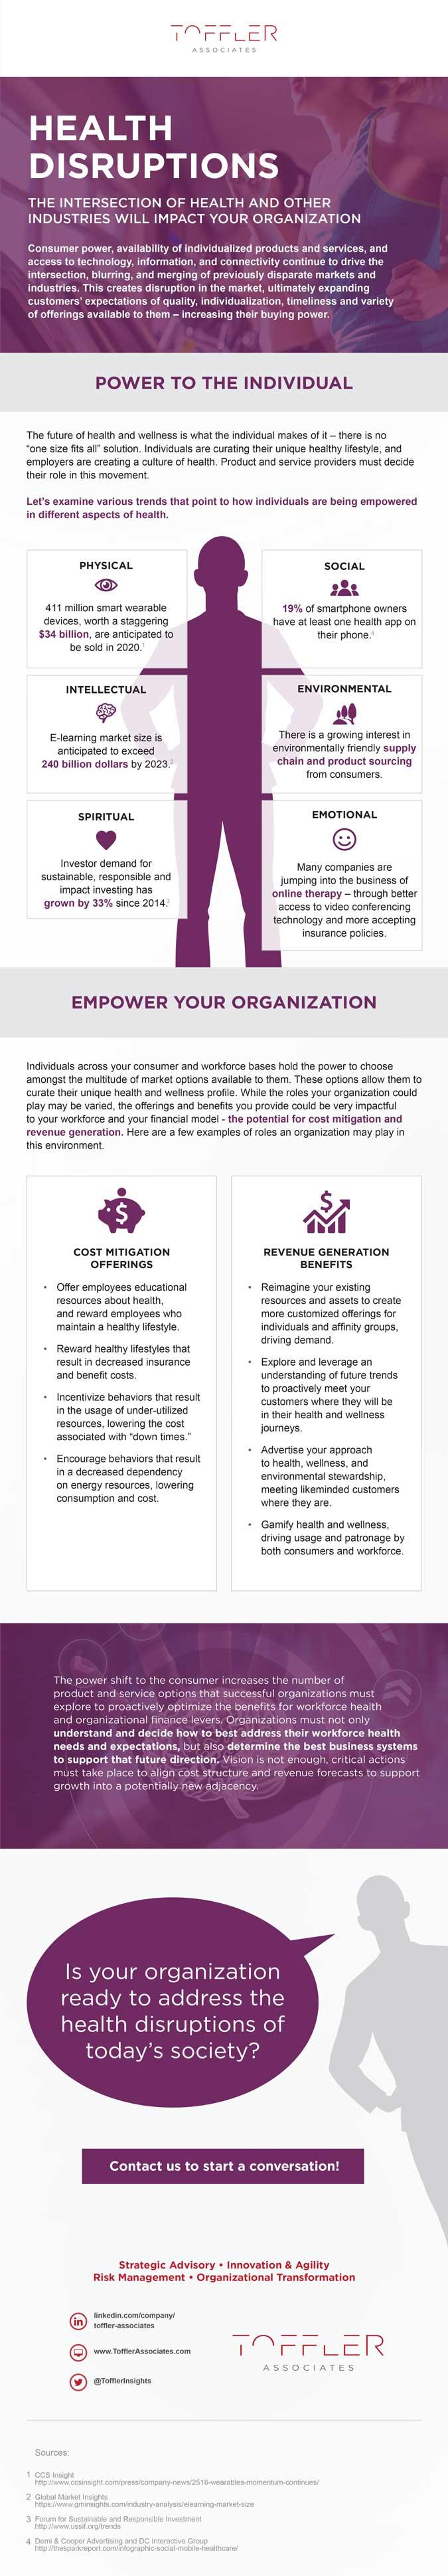 TA_Health_Disruptions_Infographics_v5.2.jpg